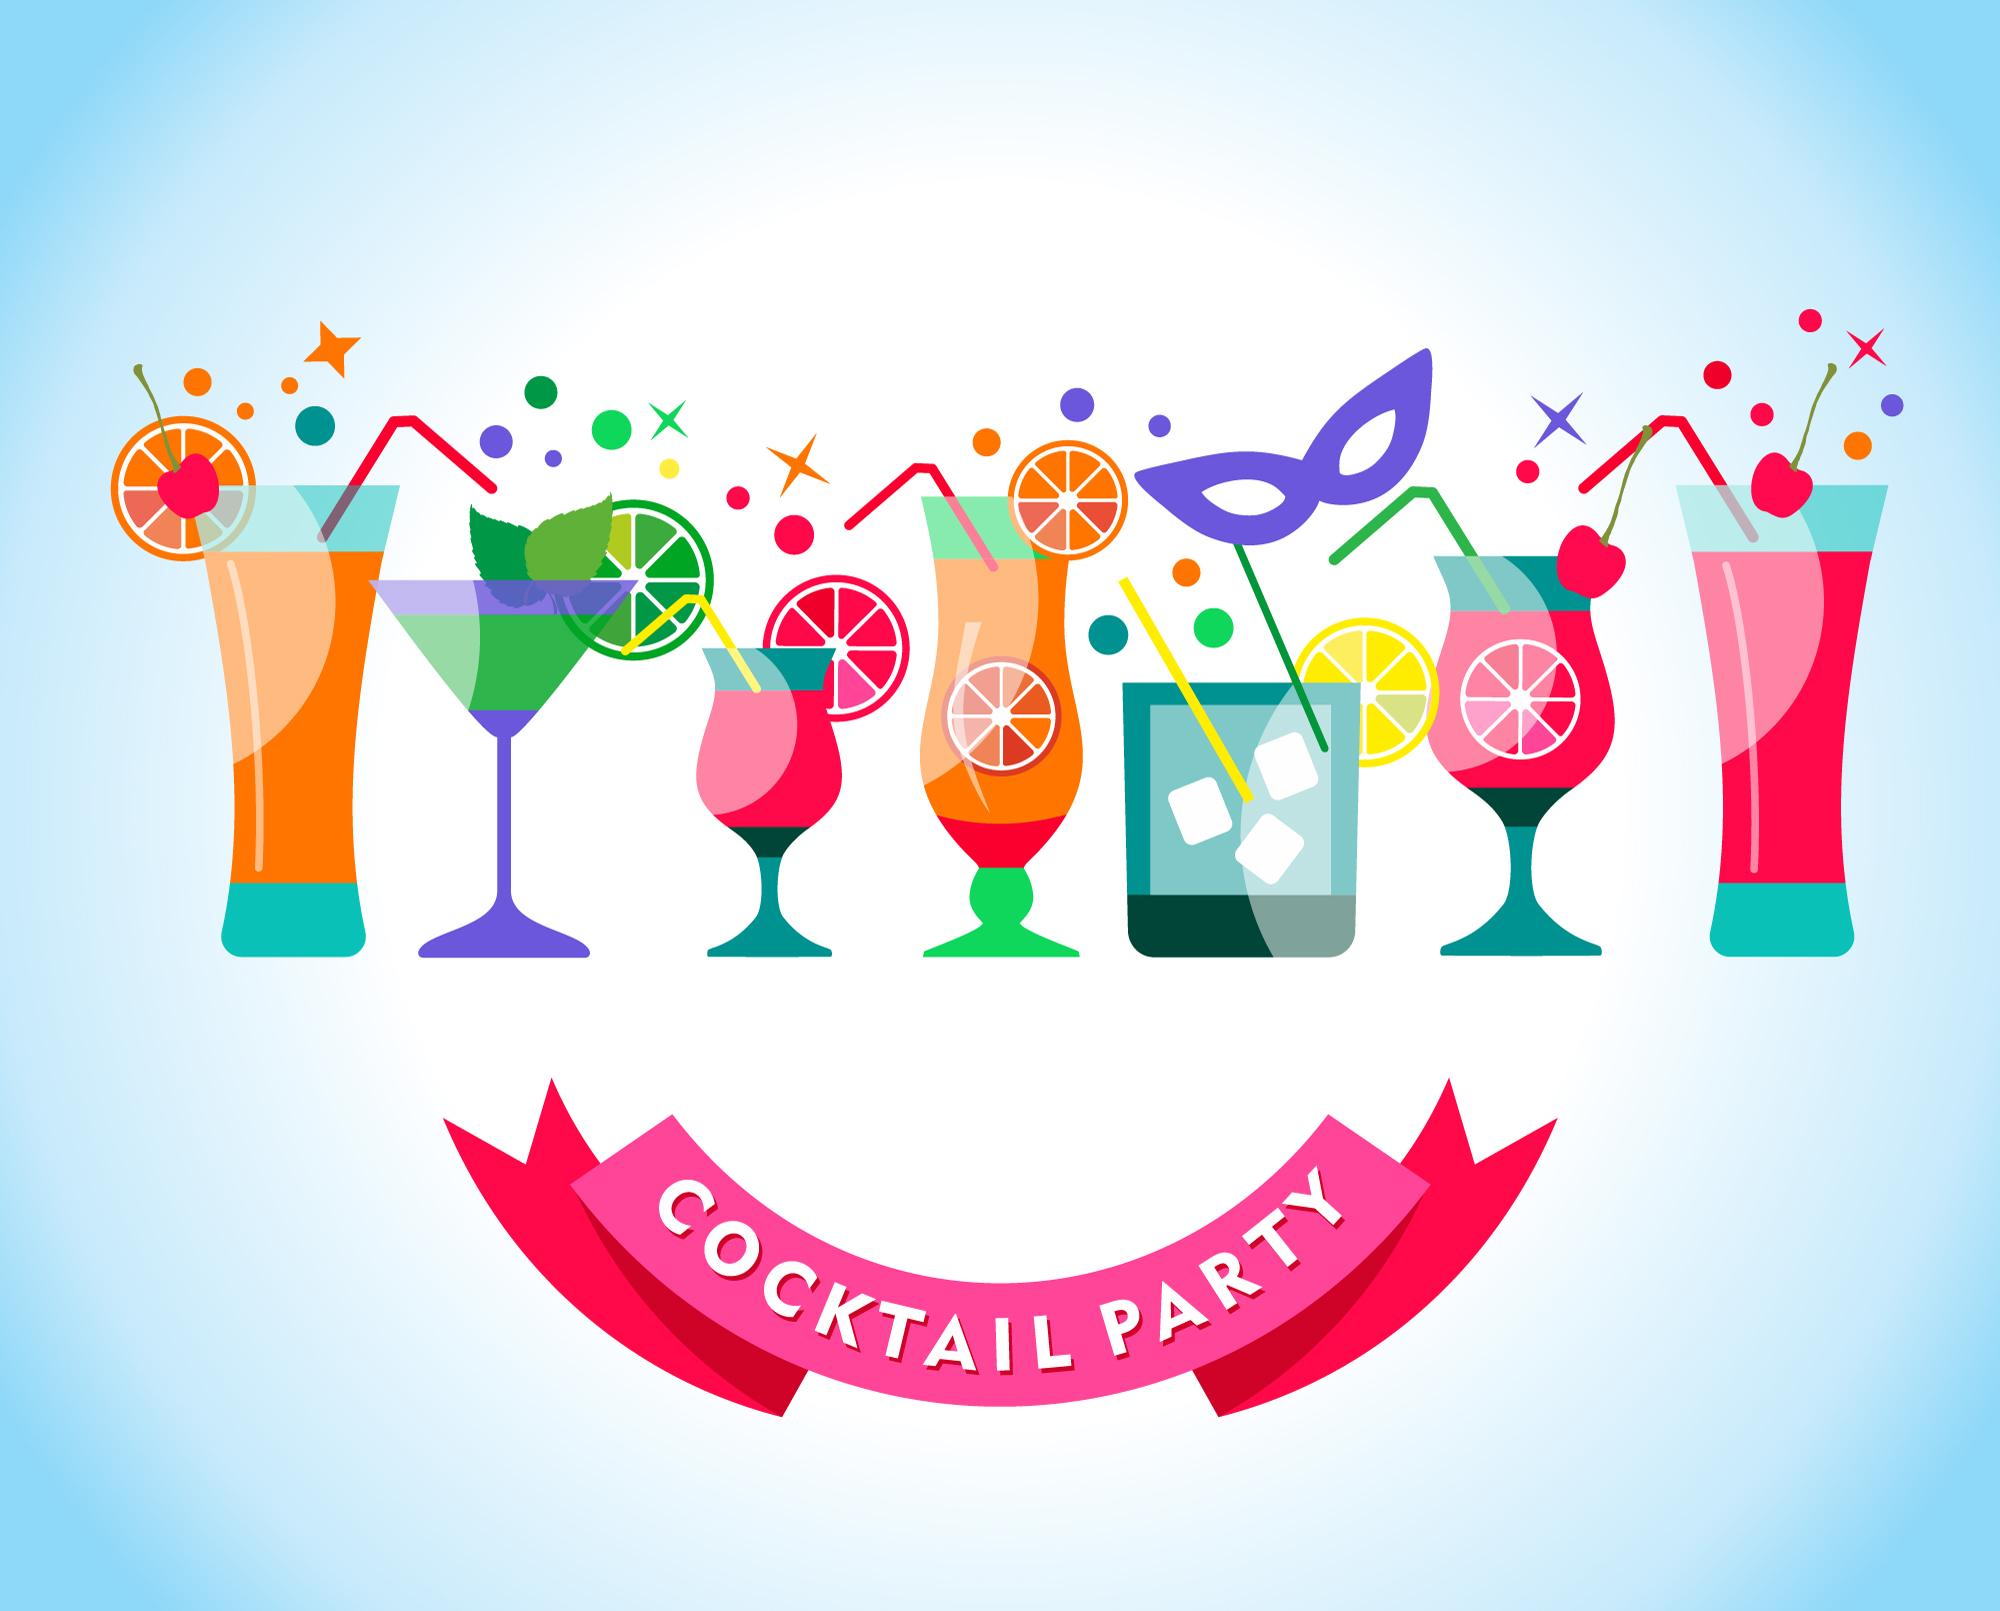 Cocktail party illustration Photoshop brush